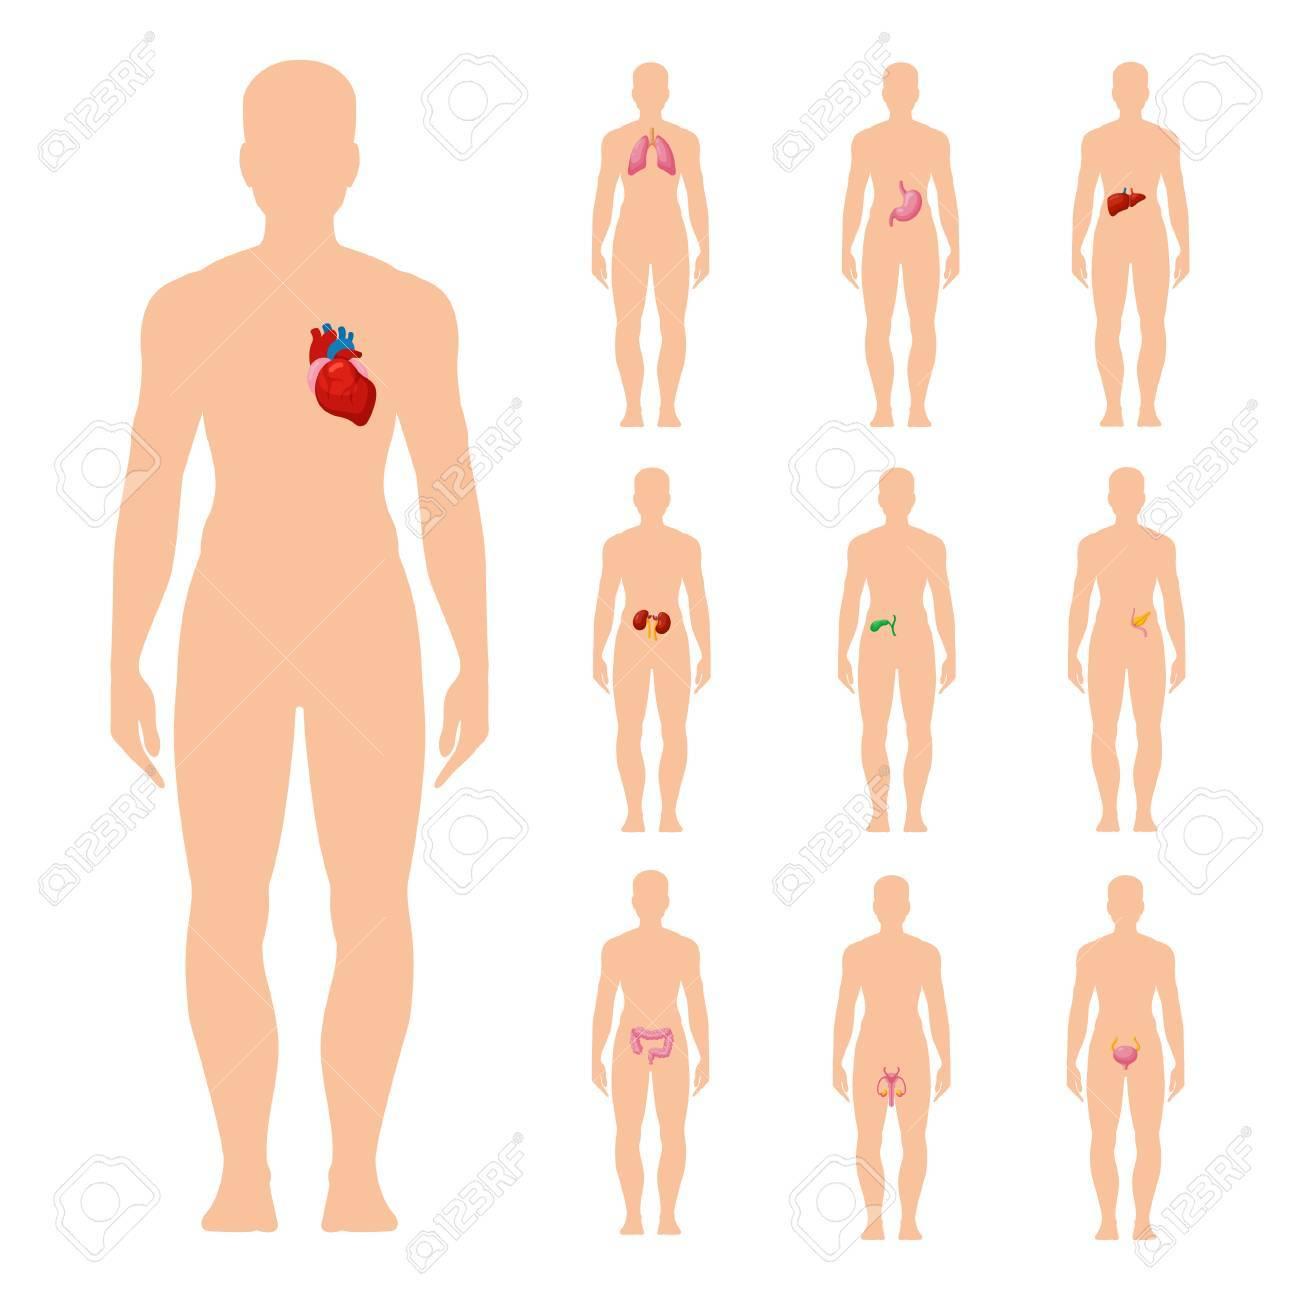 Internal Organs Set Human Body Organ System Medical Poster